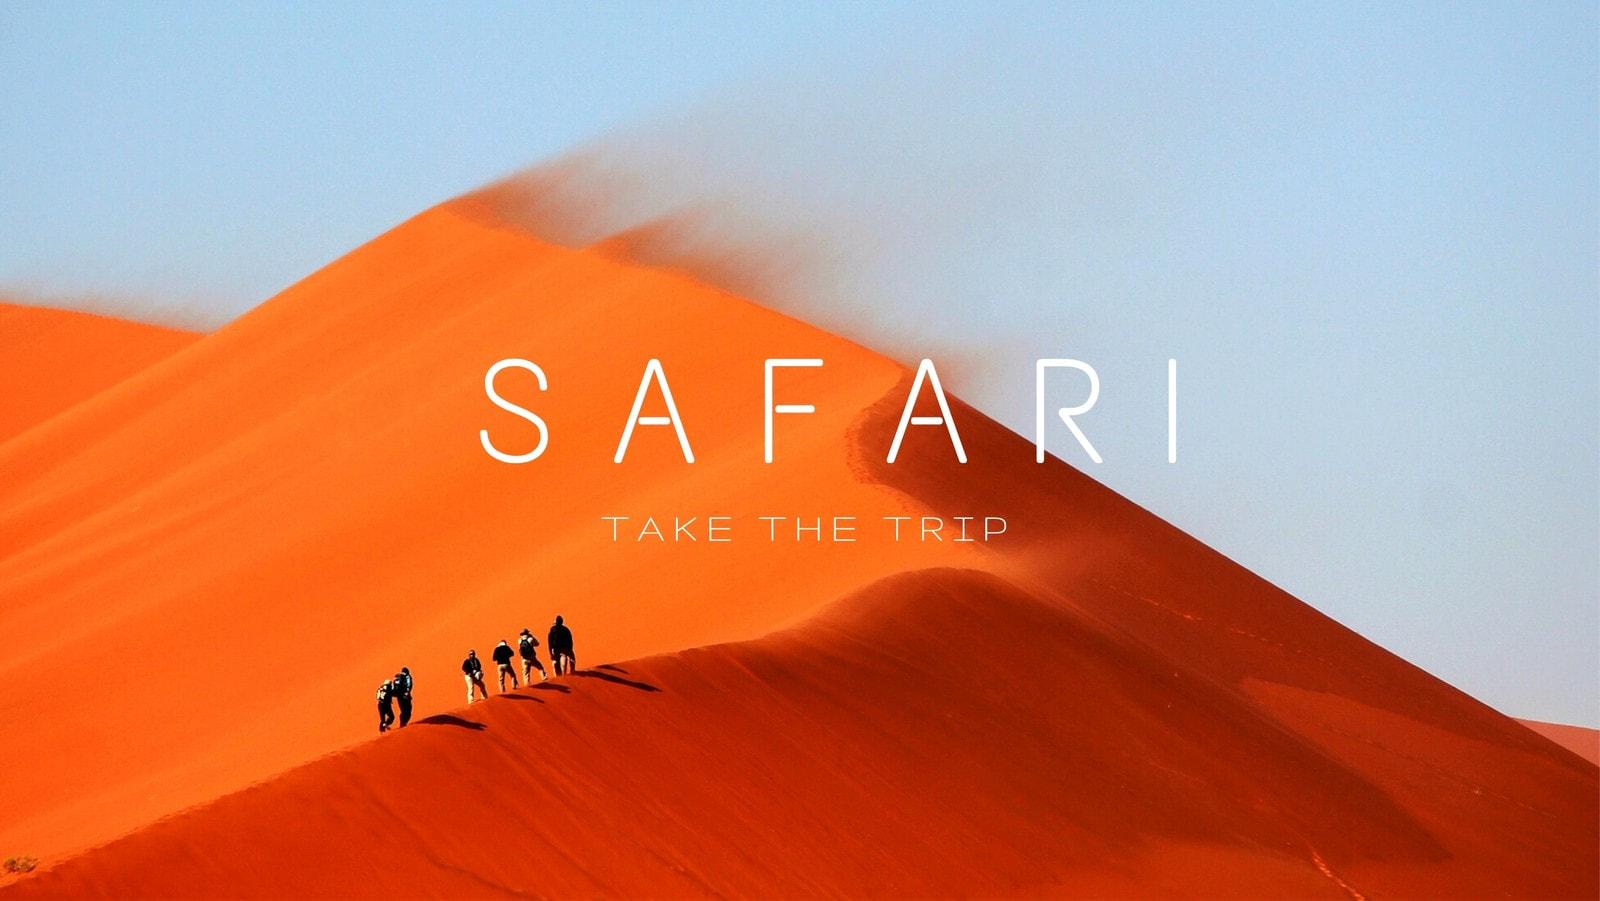 Desert Safari Facebook Cover